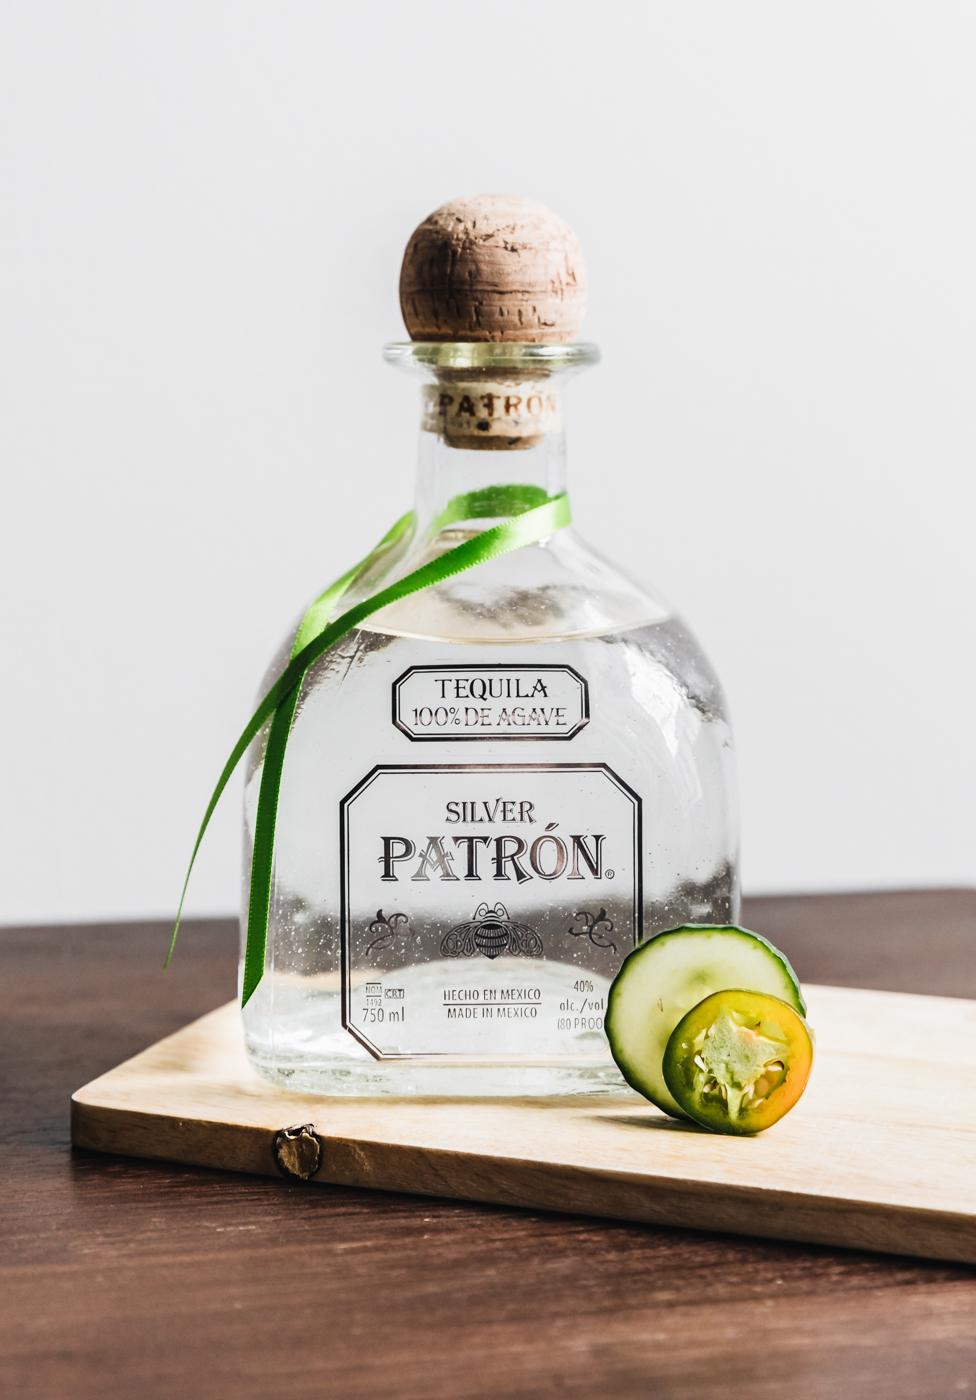 #patronthesummer, patron tequila, tequila cocktails, summer cocktails, top lifestyle blog